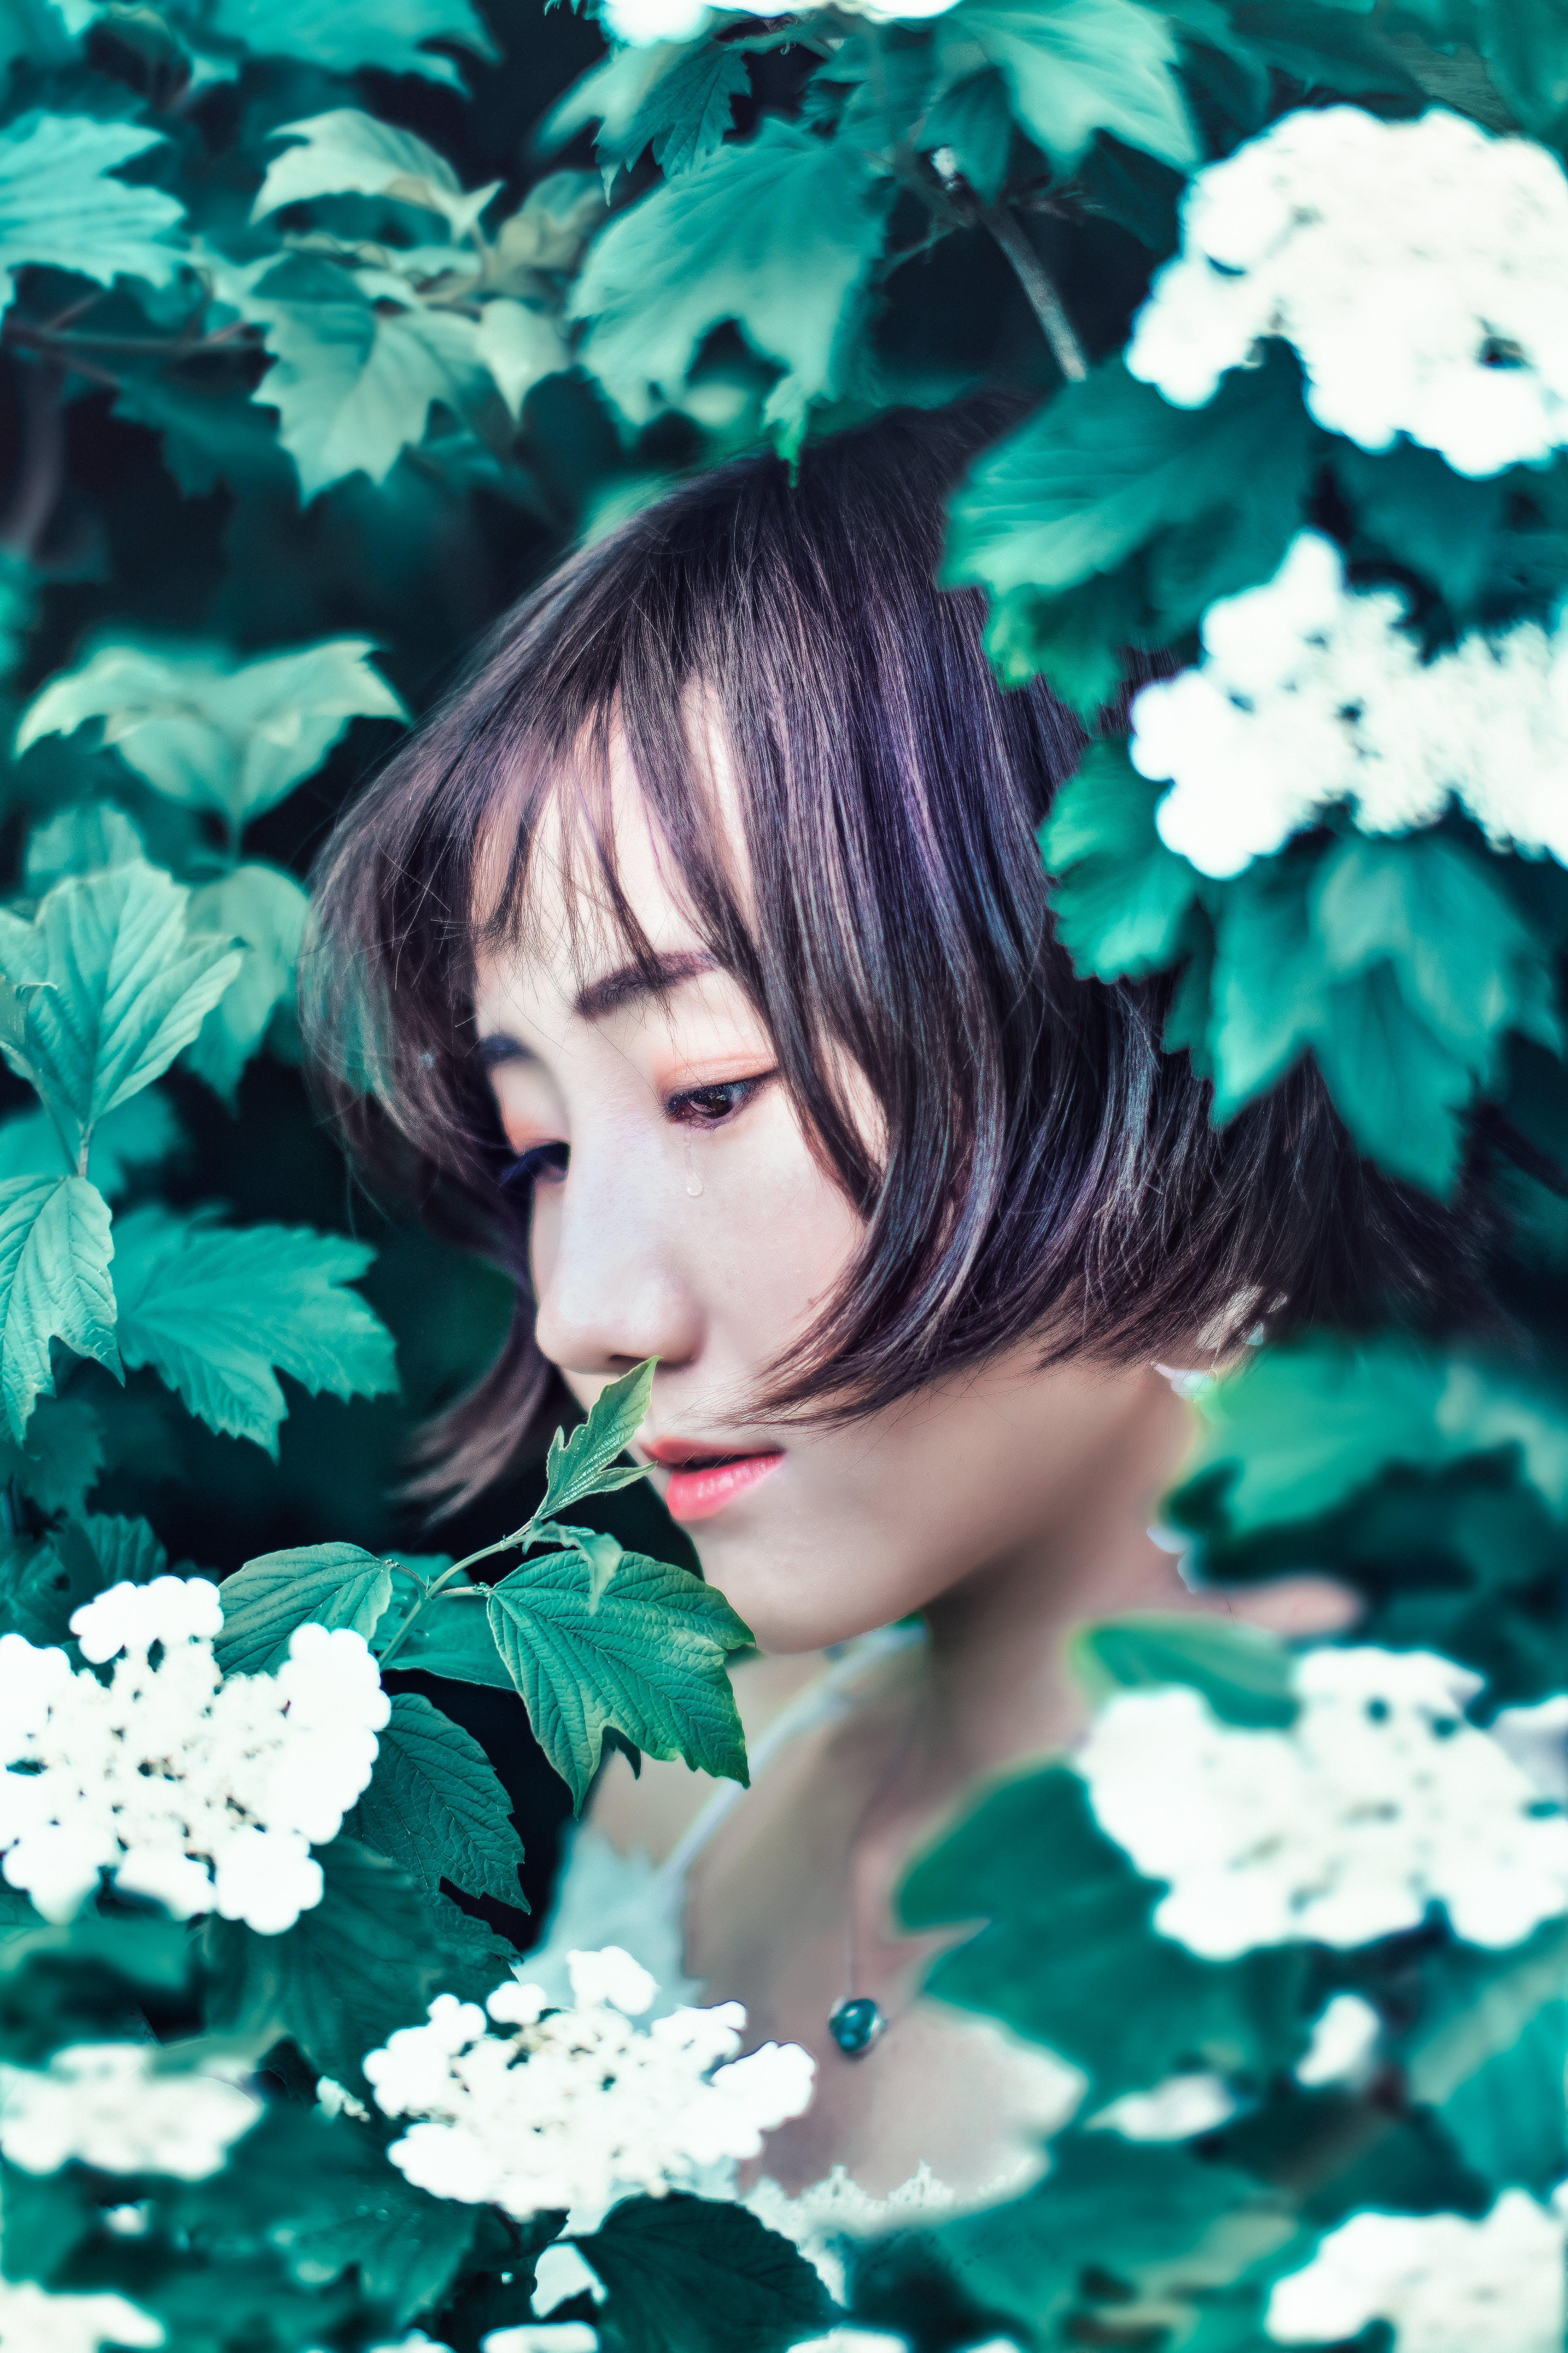 Gratis stockfoto met 夏天, 女孩, 季节, 情绪